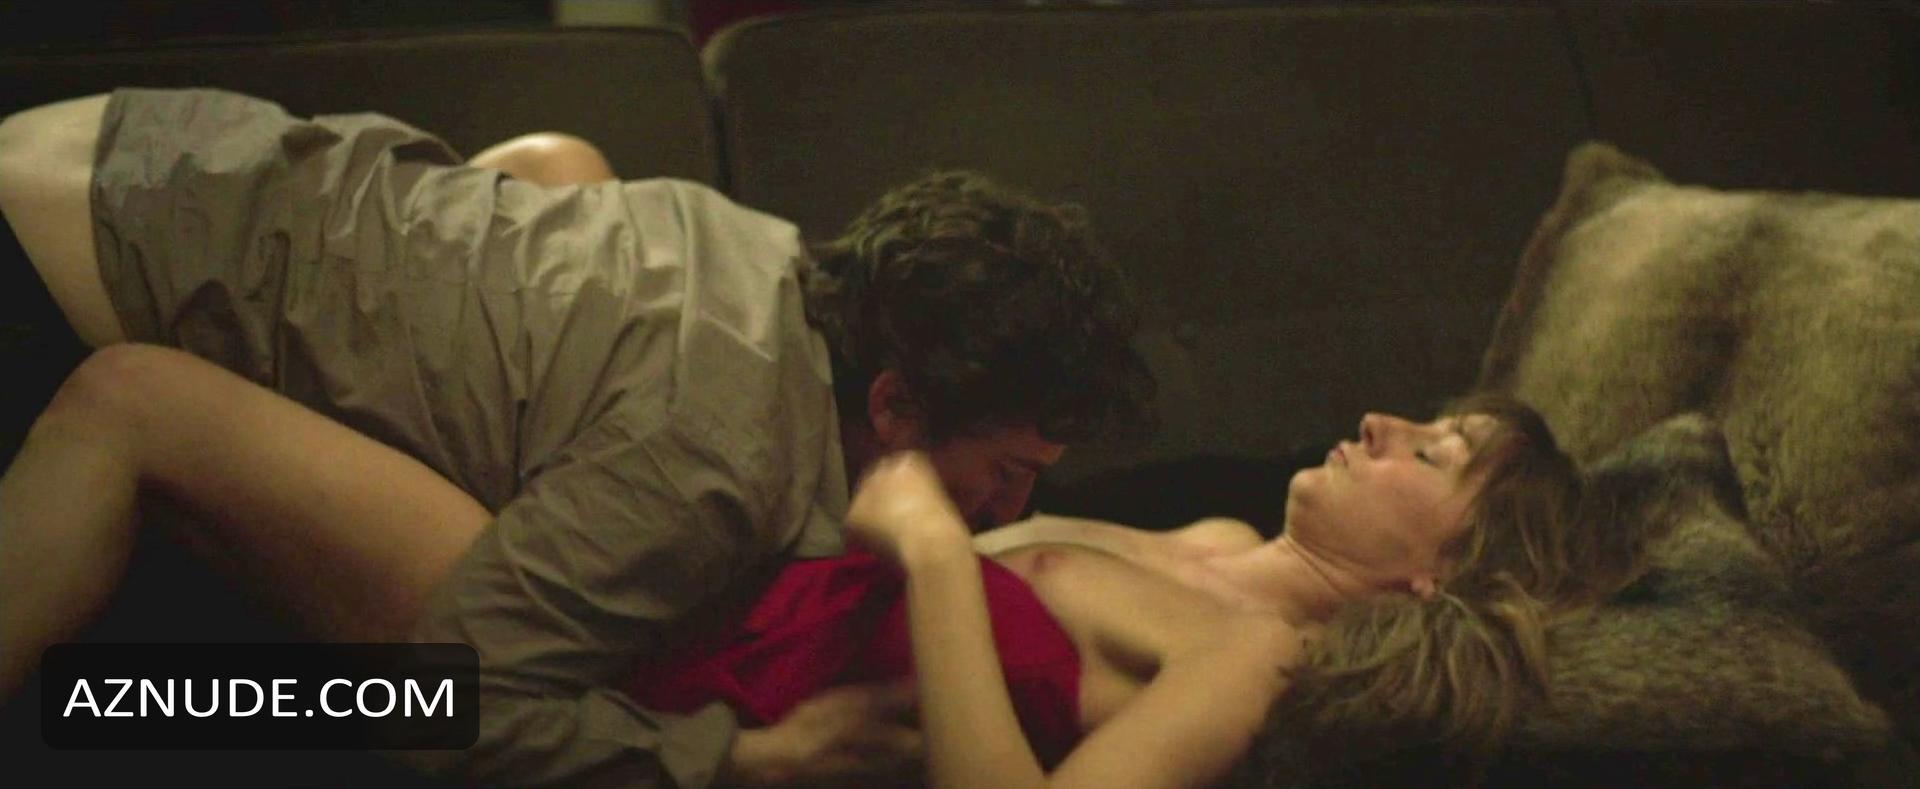 Sexfilme & Bilder GRATIS Reife frauen 50+